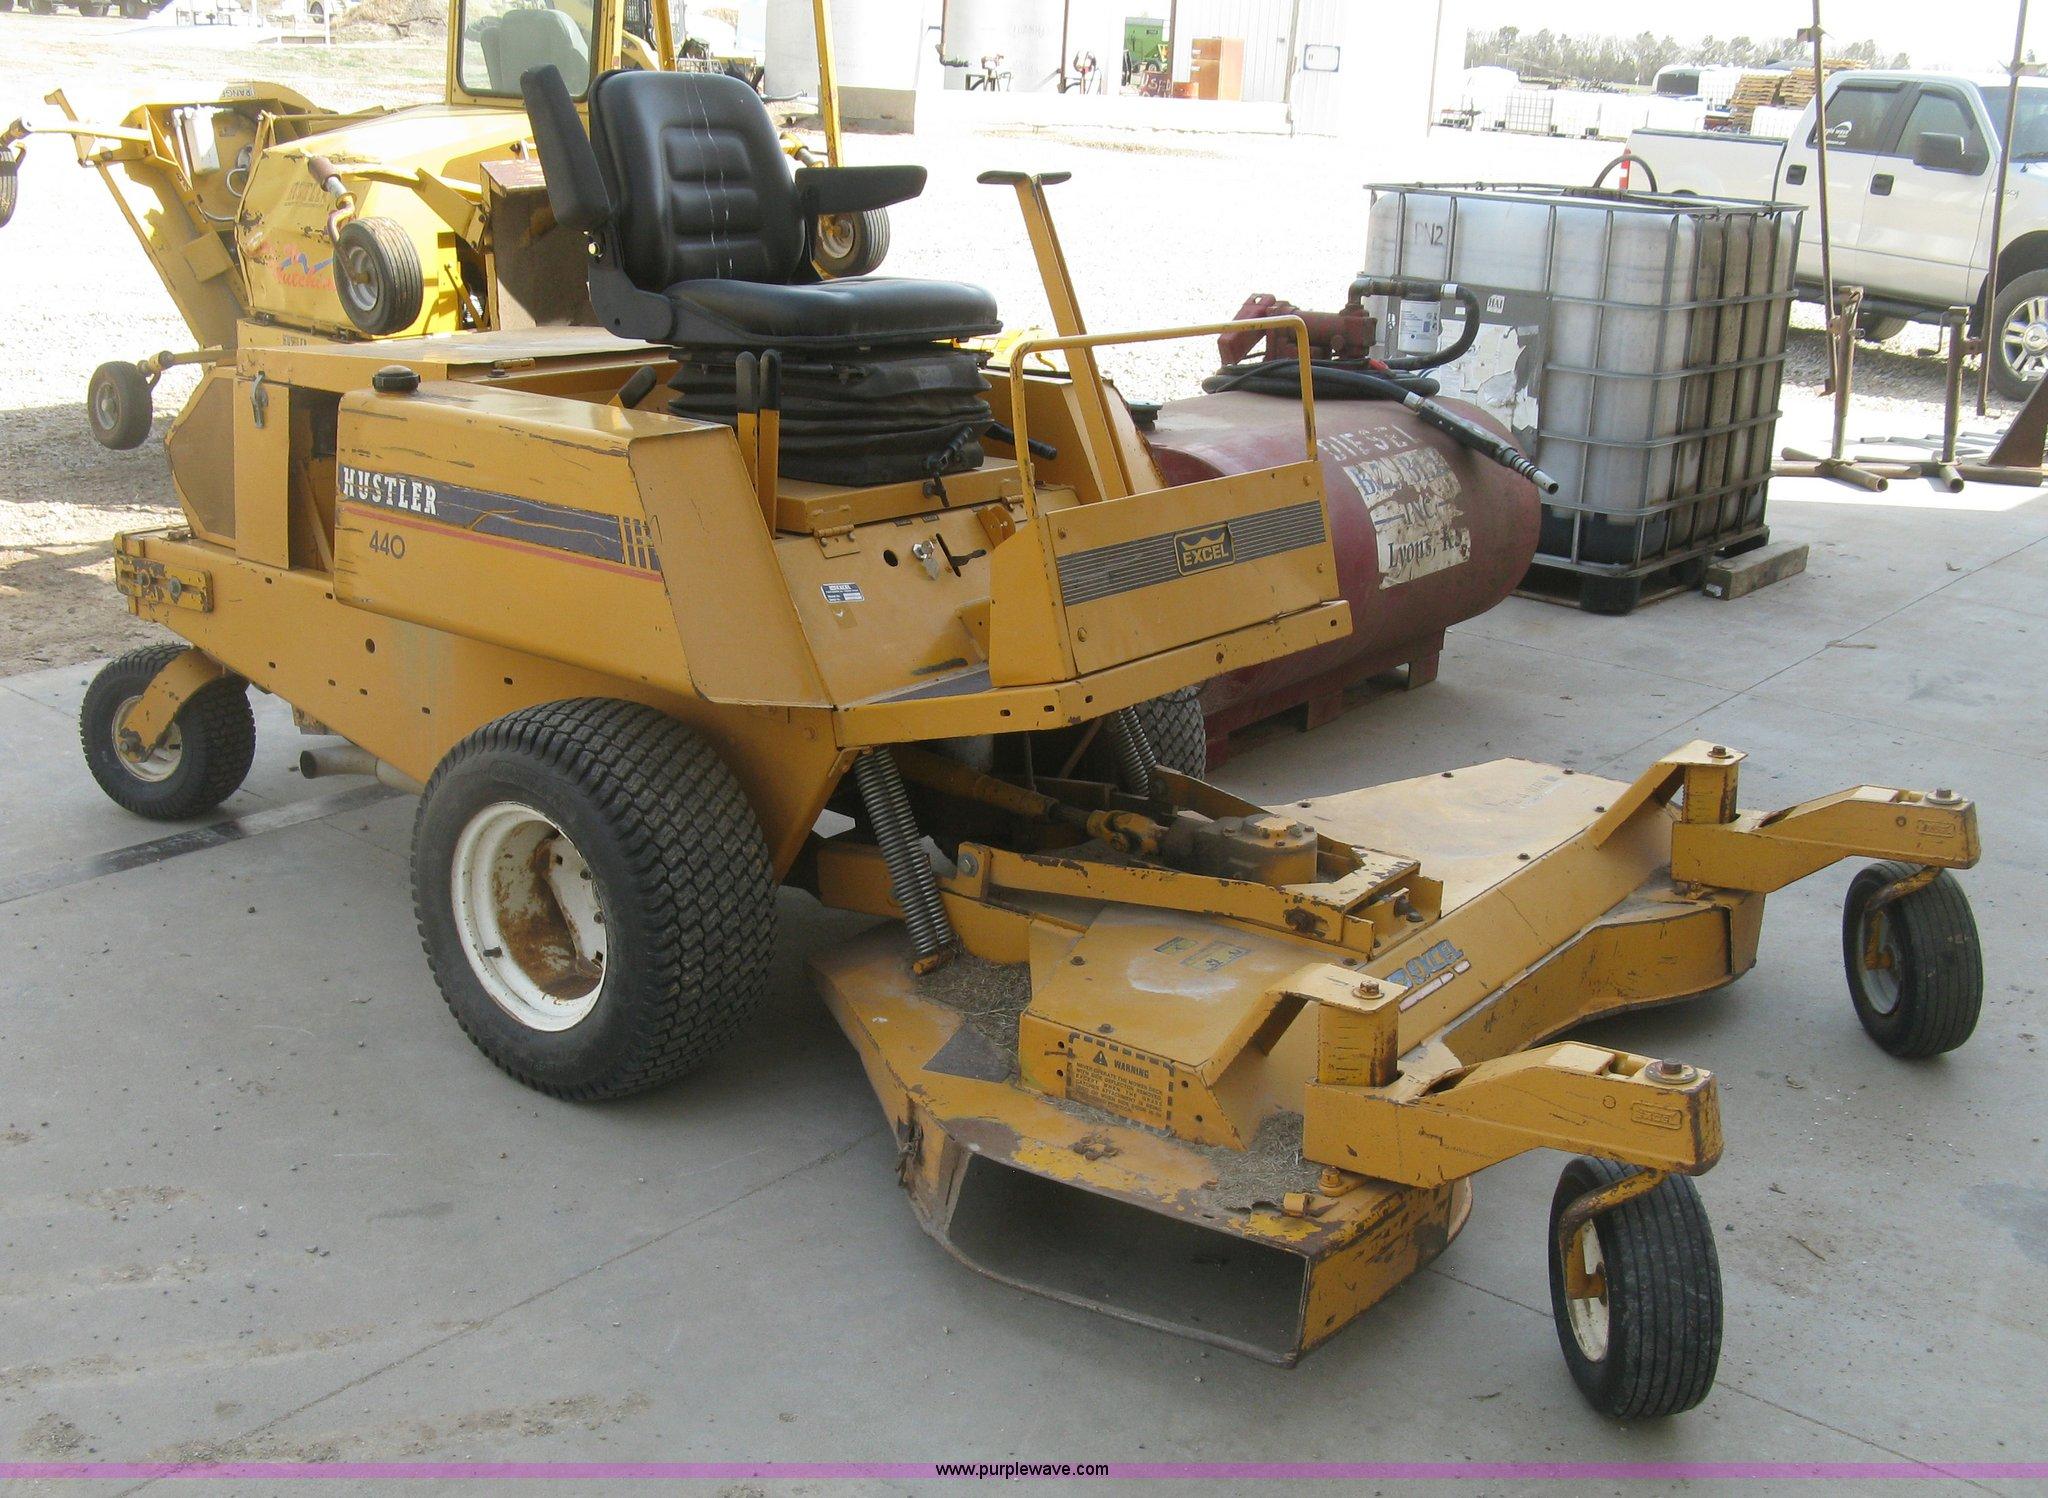 Hustler 440 lawn tractor